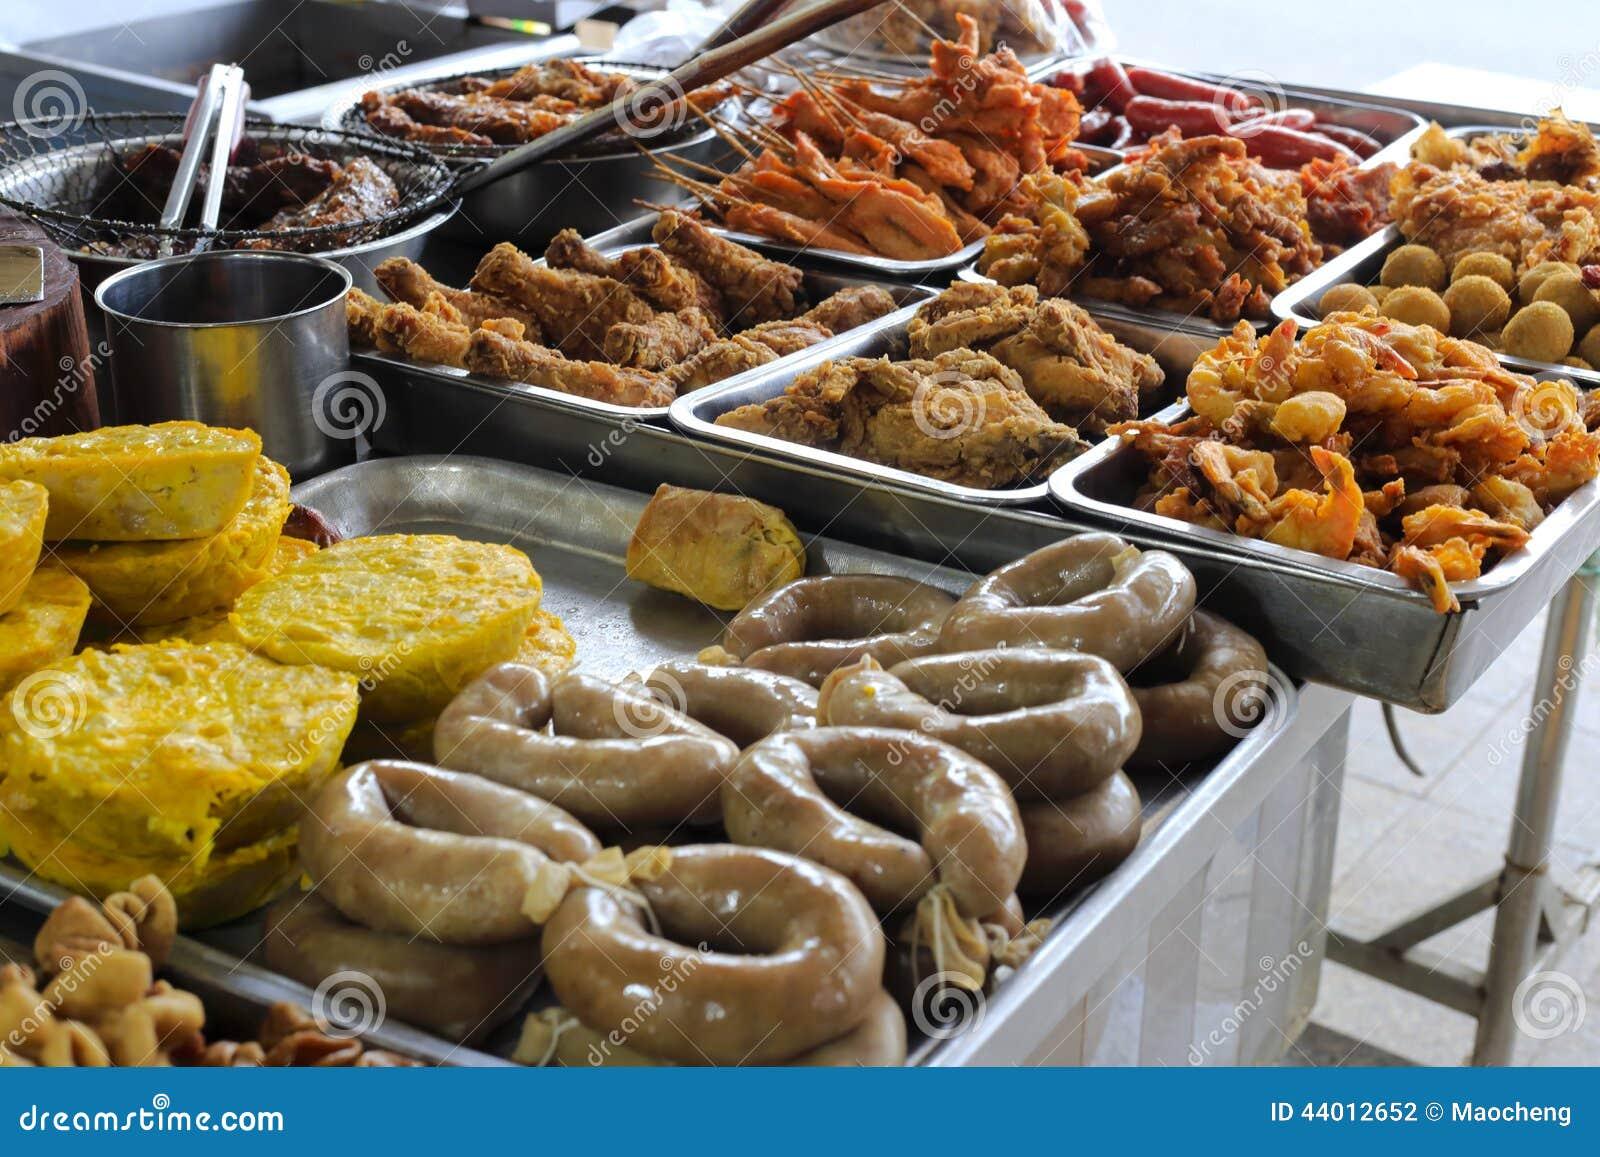 Local cuisine of longhai city stock photo image 44012652 for Cuisine en locale